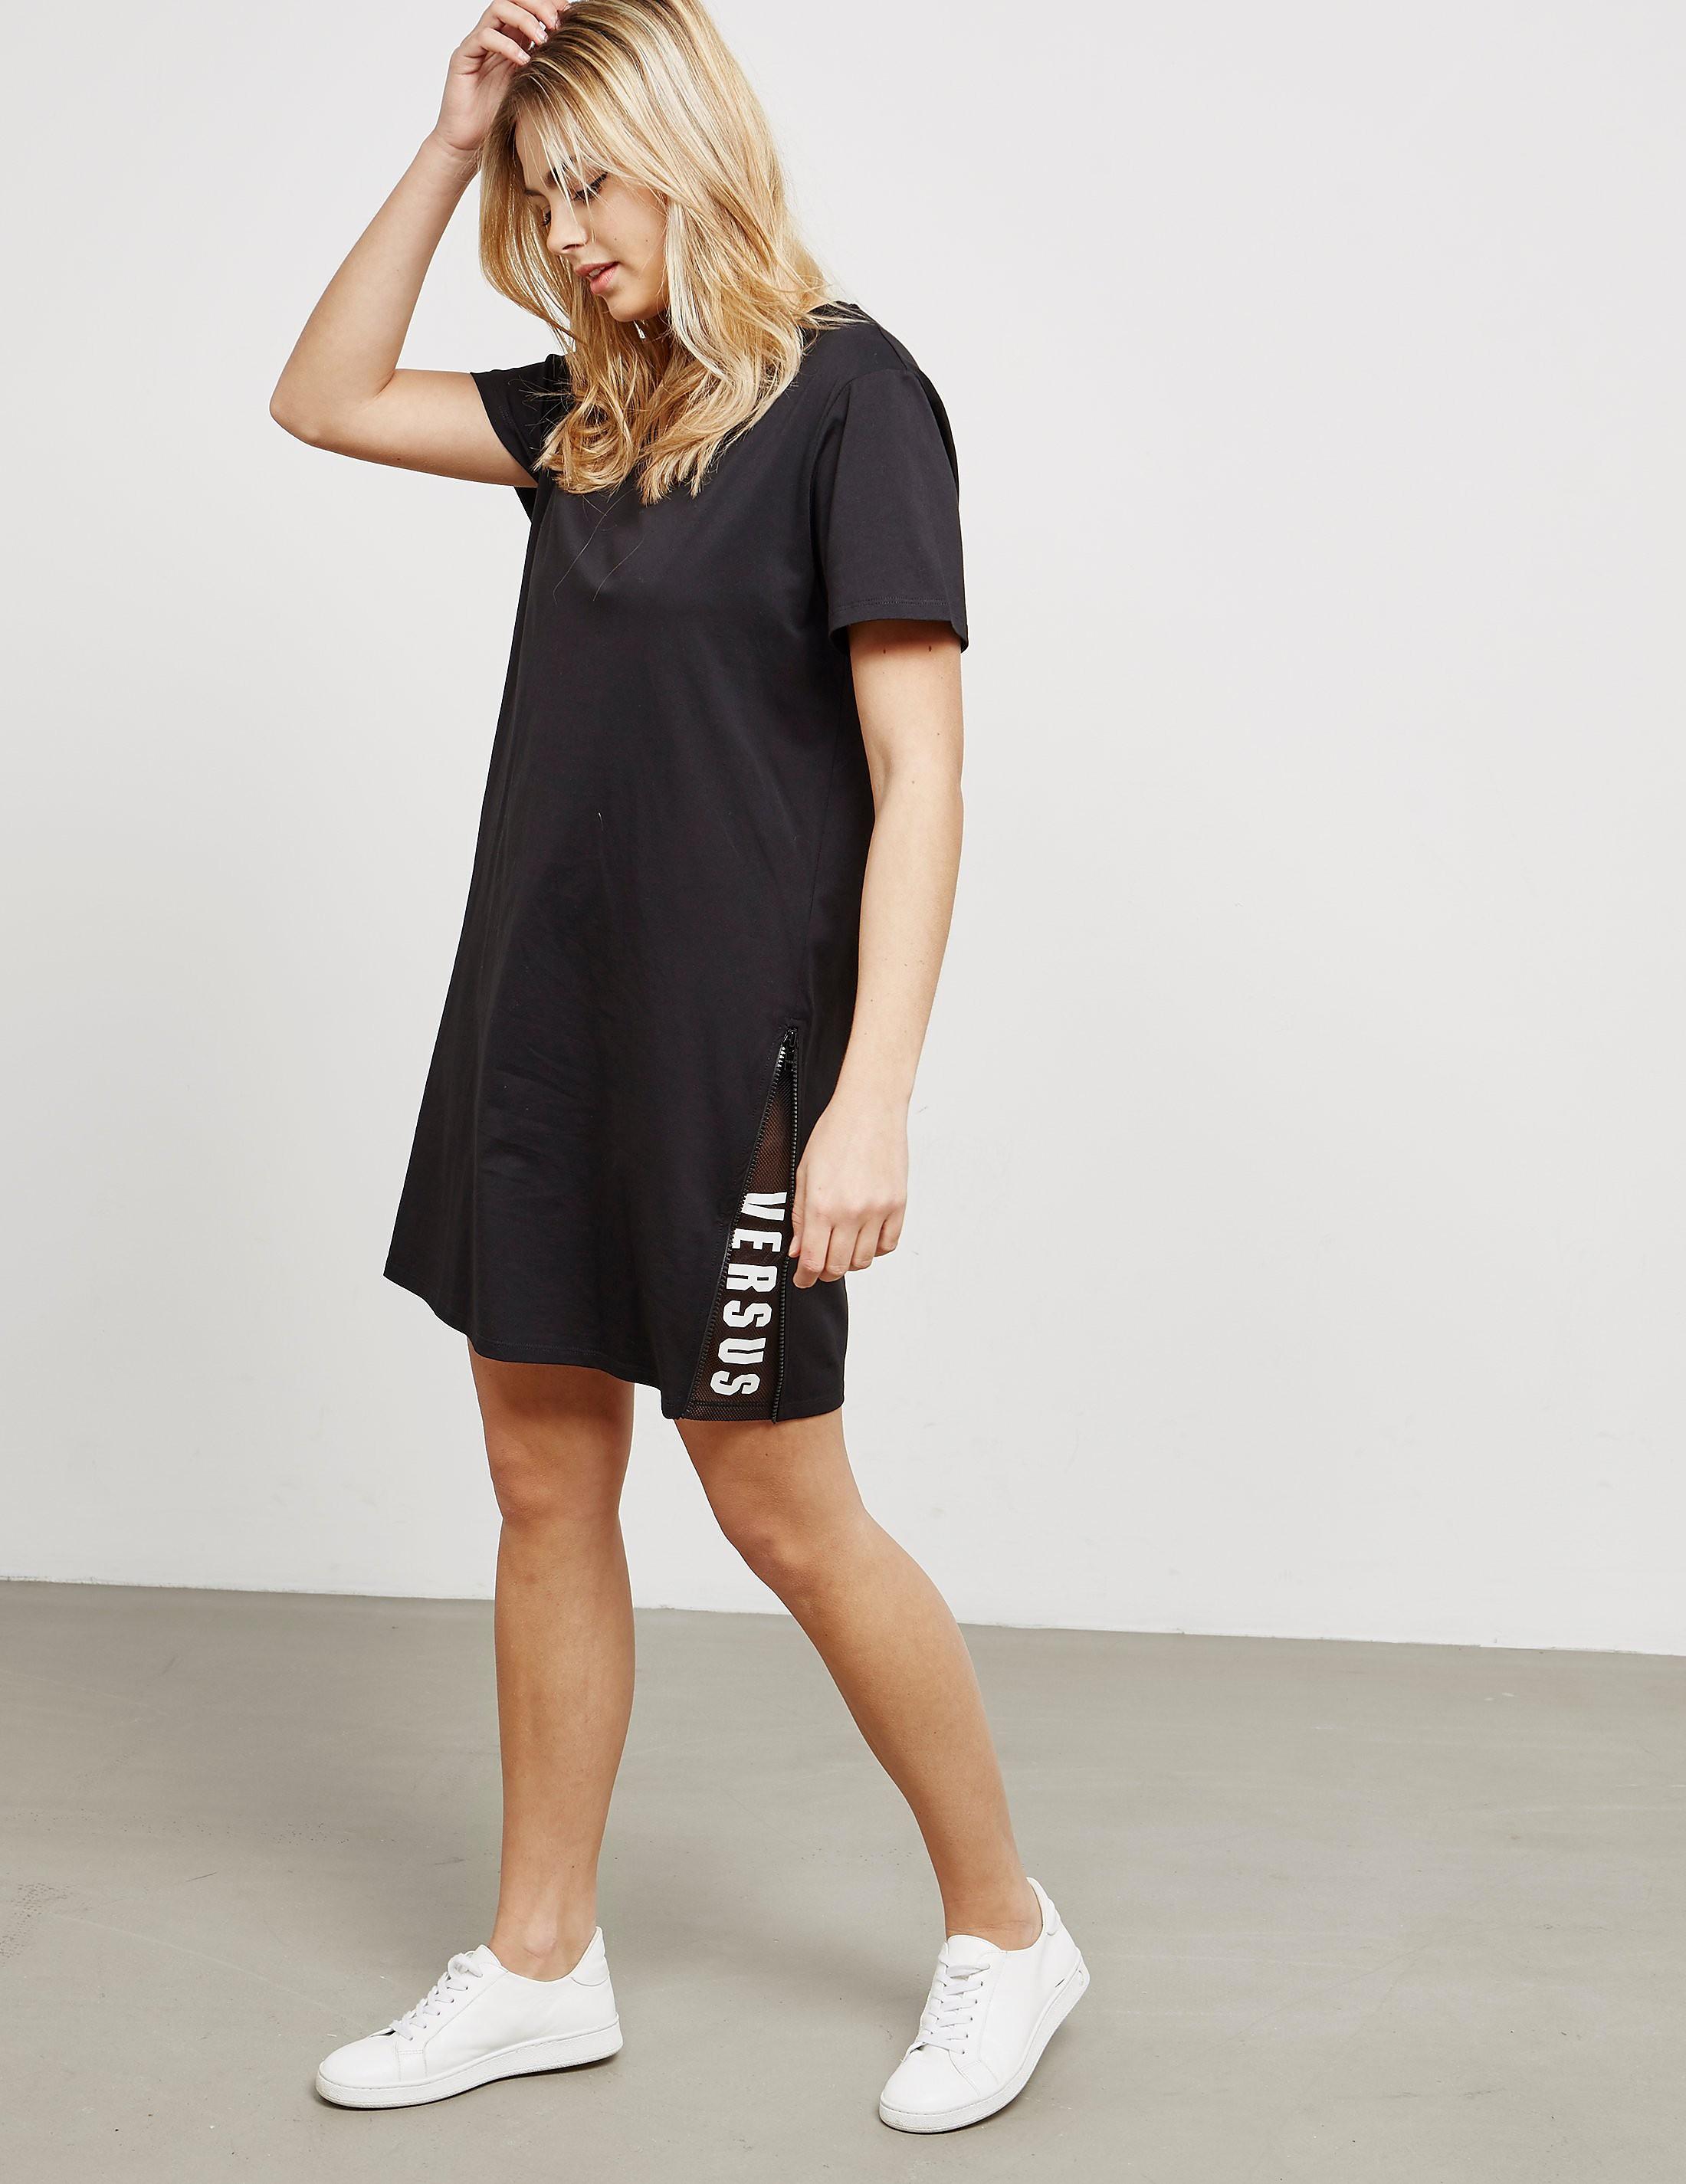 Versus Versace Logo Short Sleeve Tee Dress